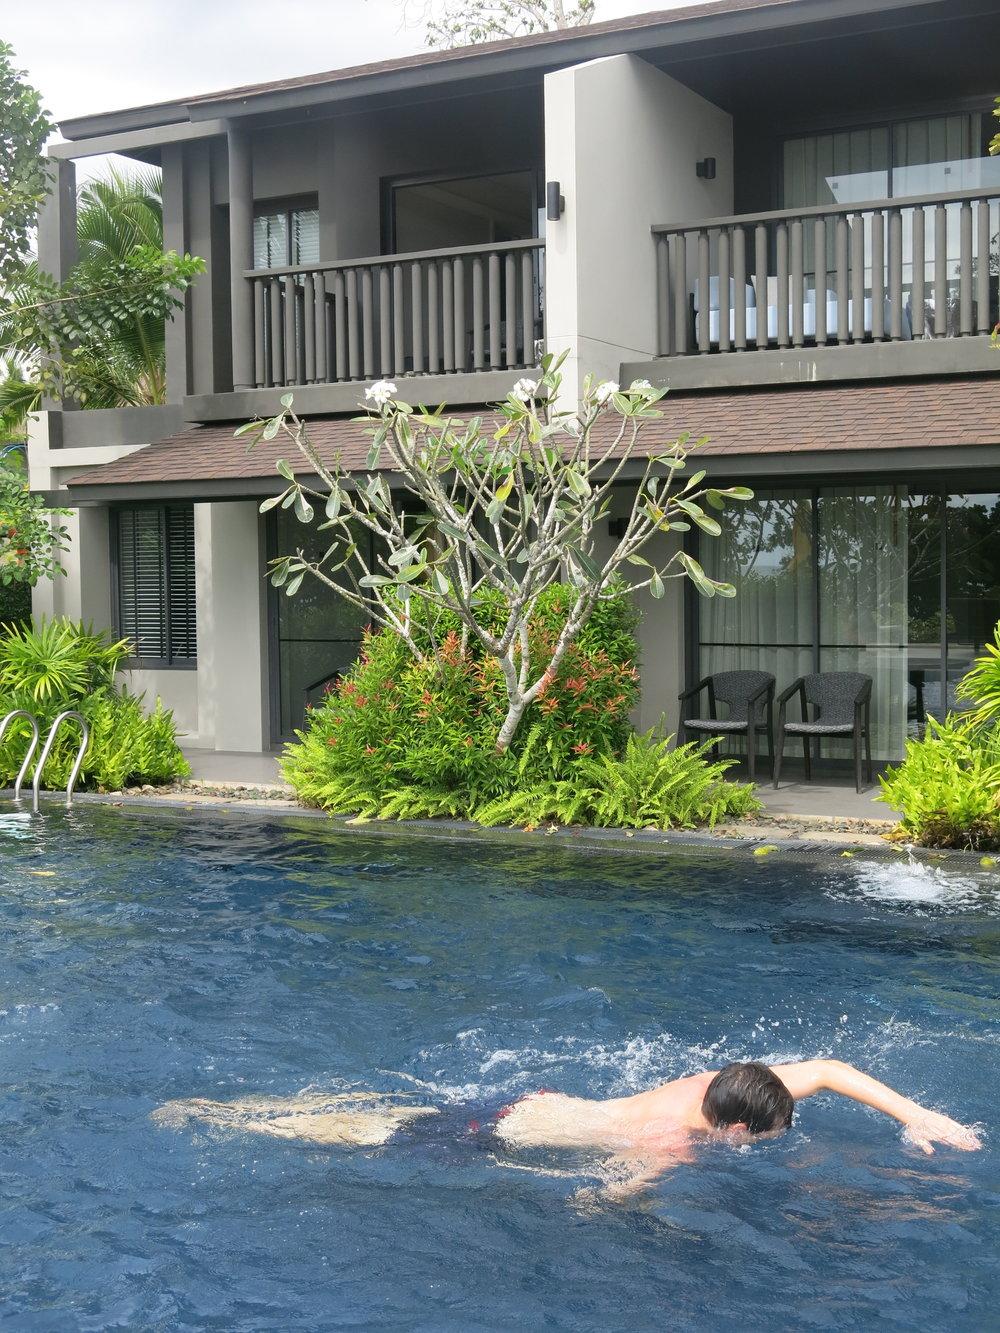 Morning swim at the new Shell Sea hotel Krabi